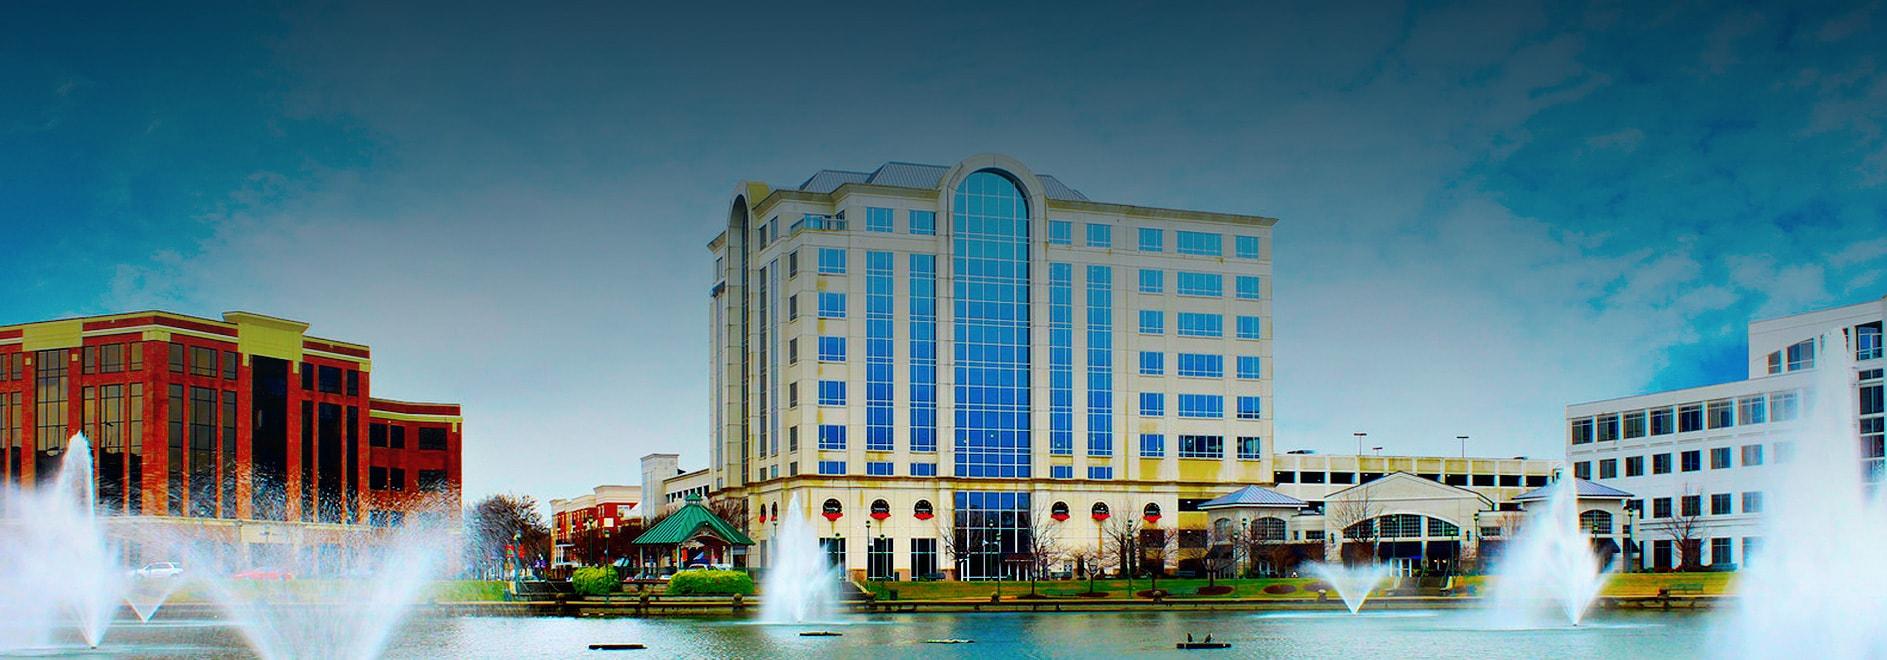 Newport News Top Business Web Design Company